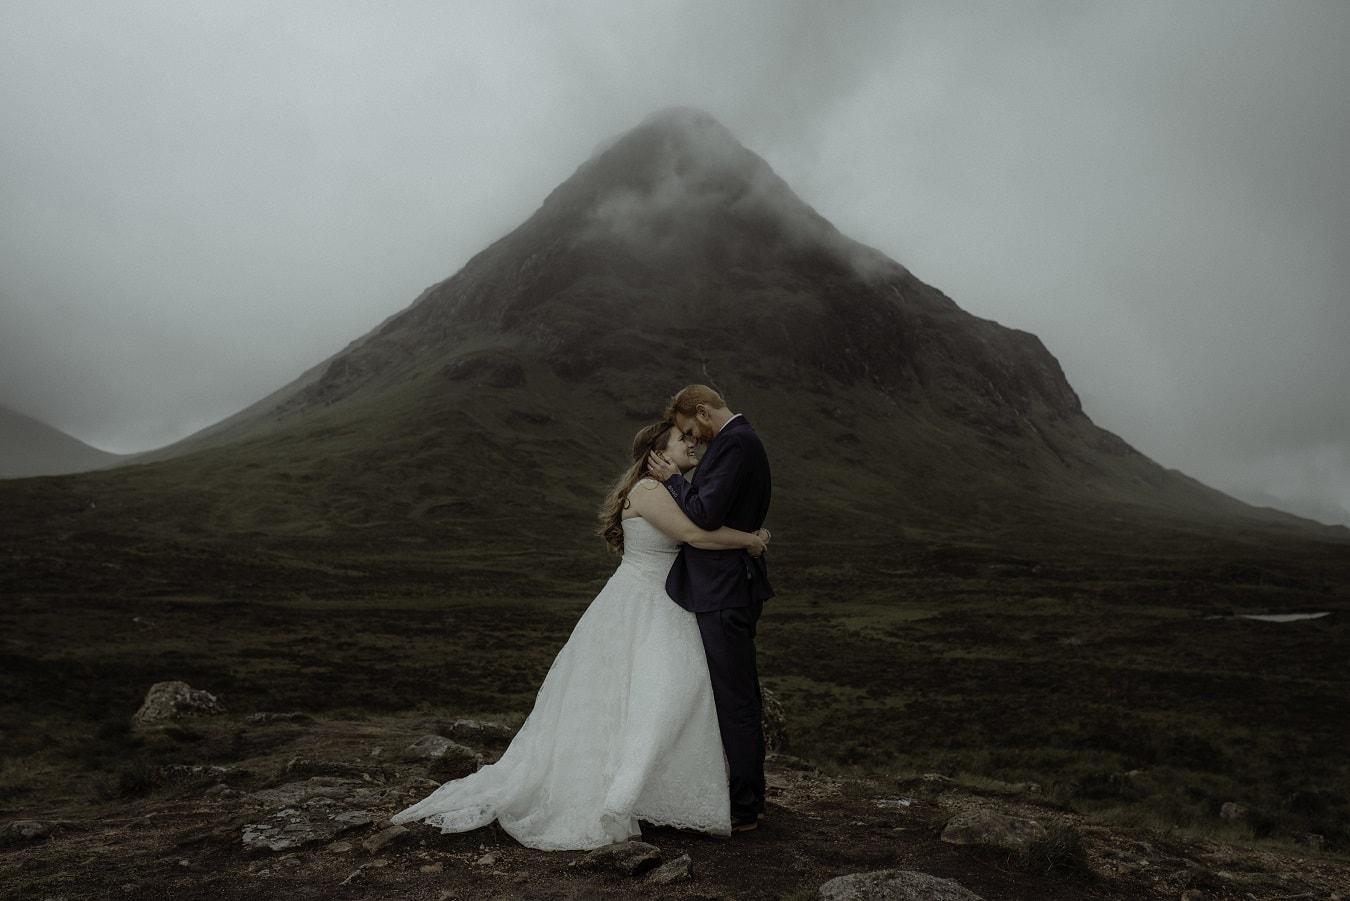 claire-juliet-paton-photography-elopement-wedding-adventure-intimate-destination-unique-scotland-ireland-usa-canada-new-zealand-iceland-about-reduction-